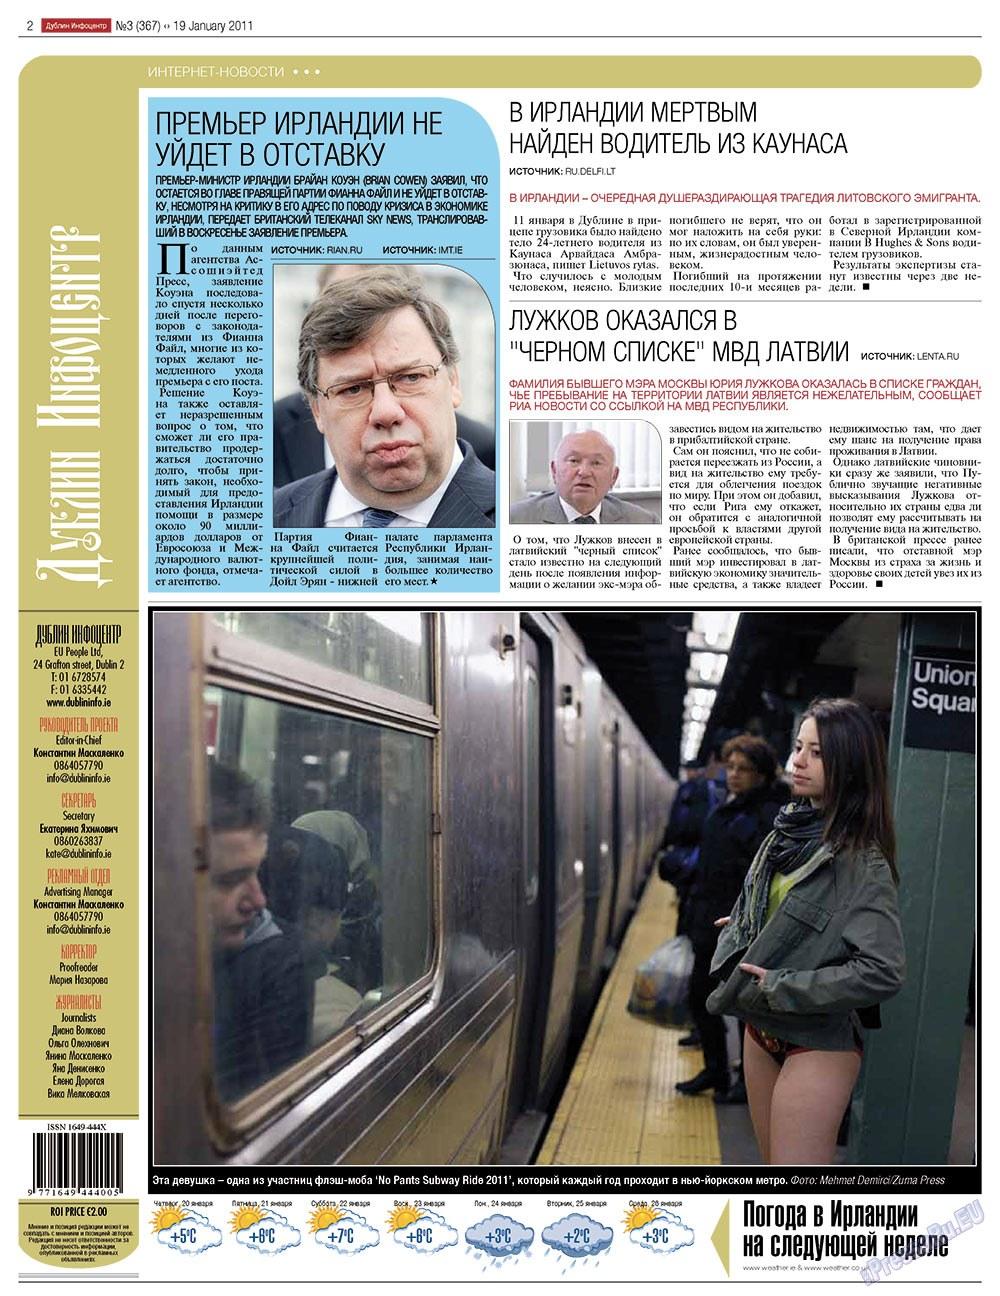 Дублин инфоцентр (газета). 2011 год, номер 3, стр. 2